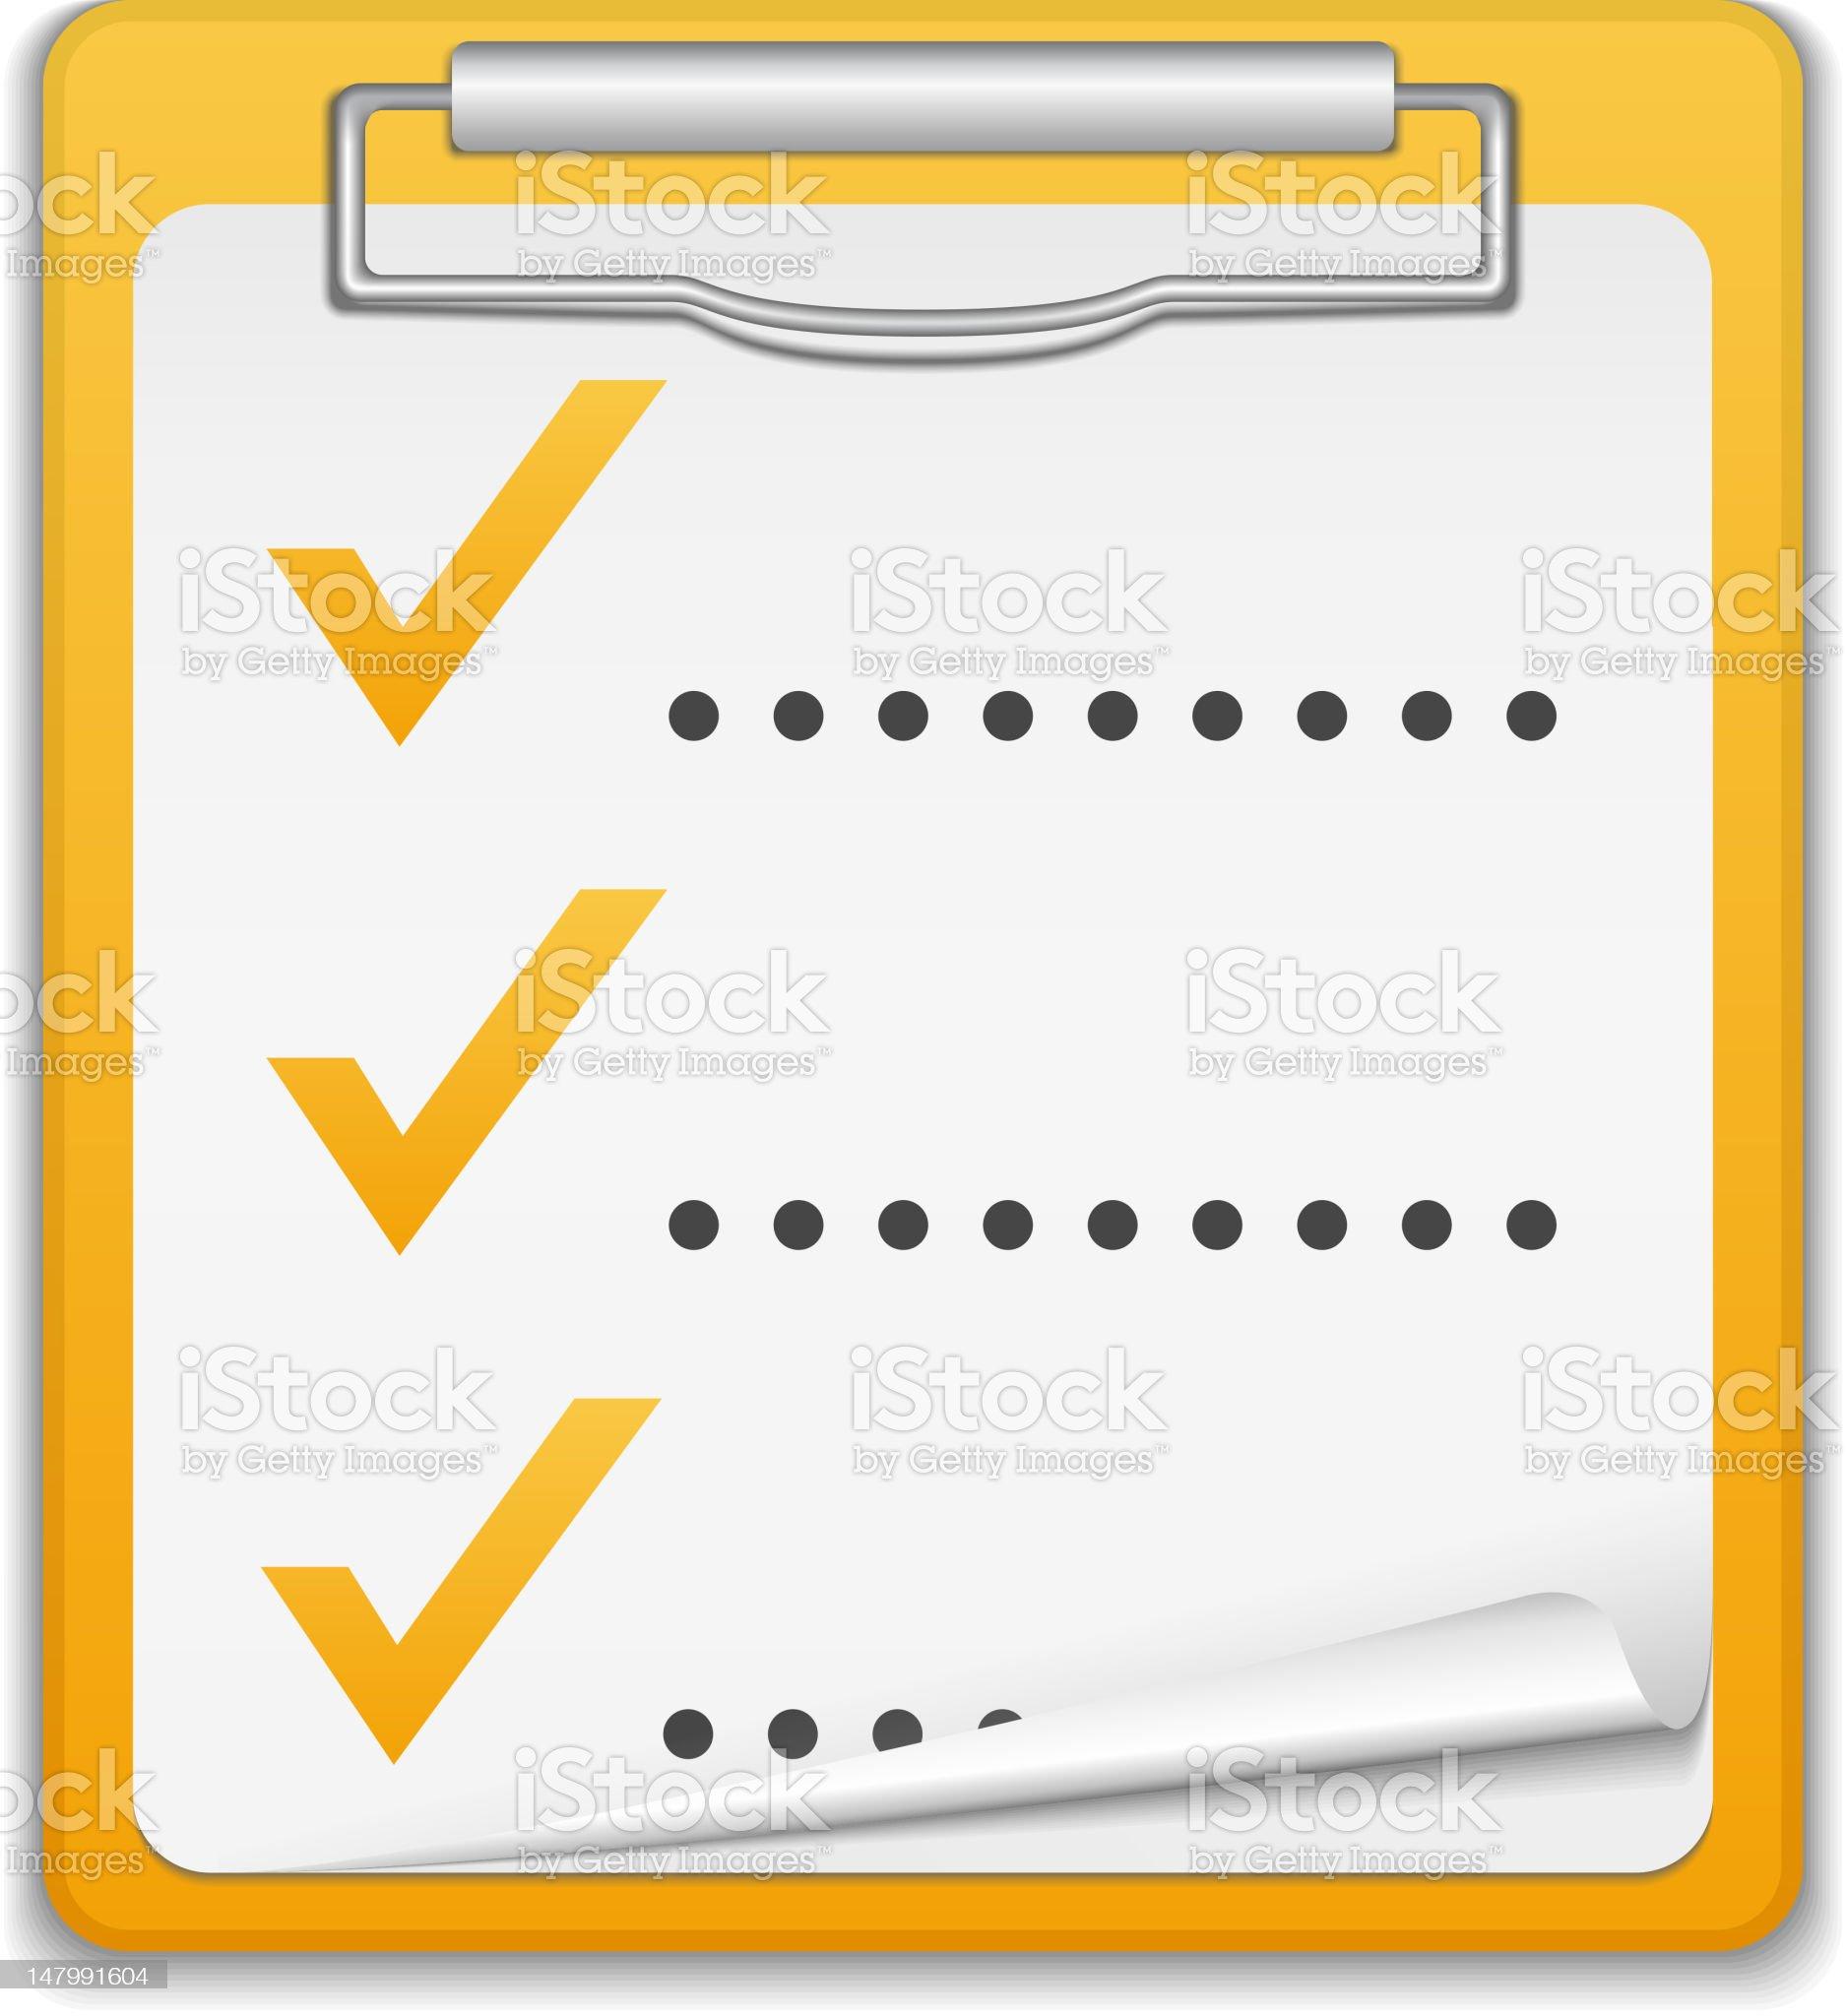 A three item checklist on a clipboard royalty-free stock vector art